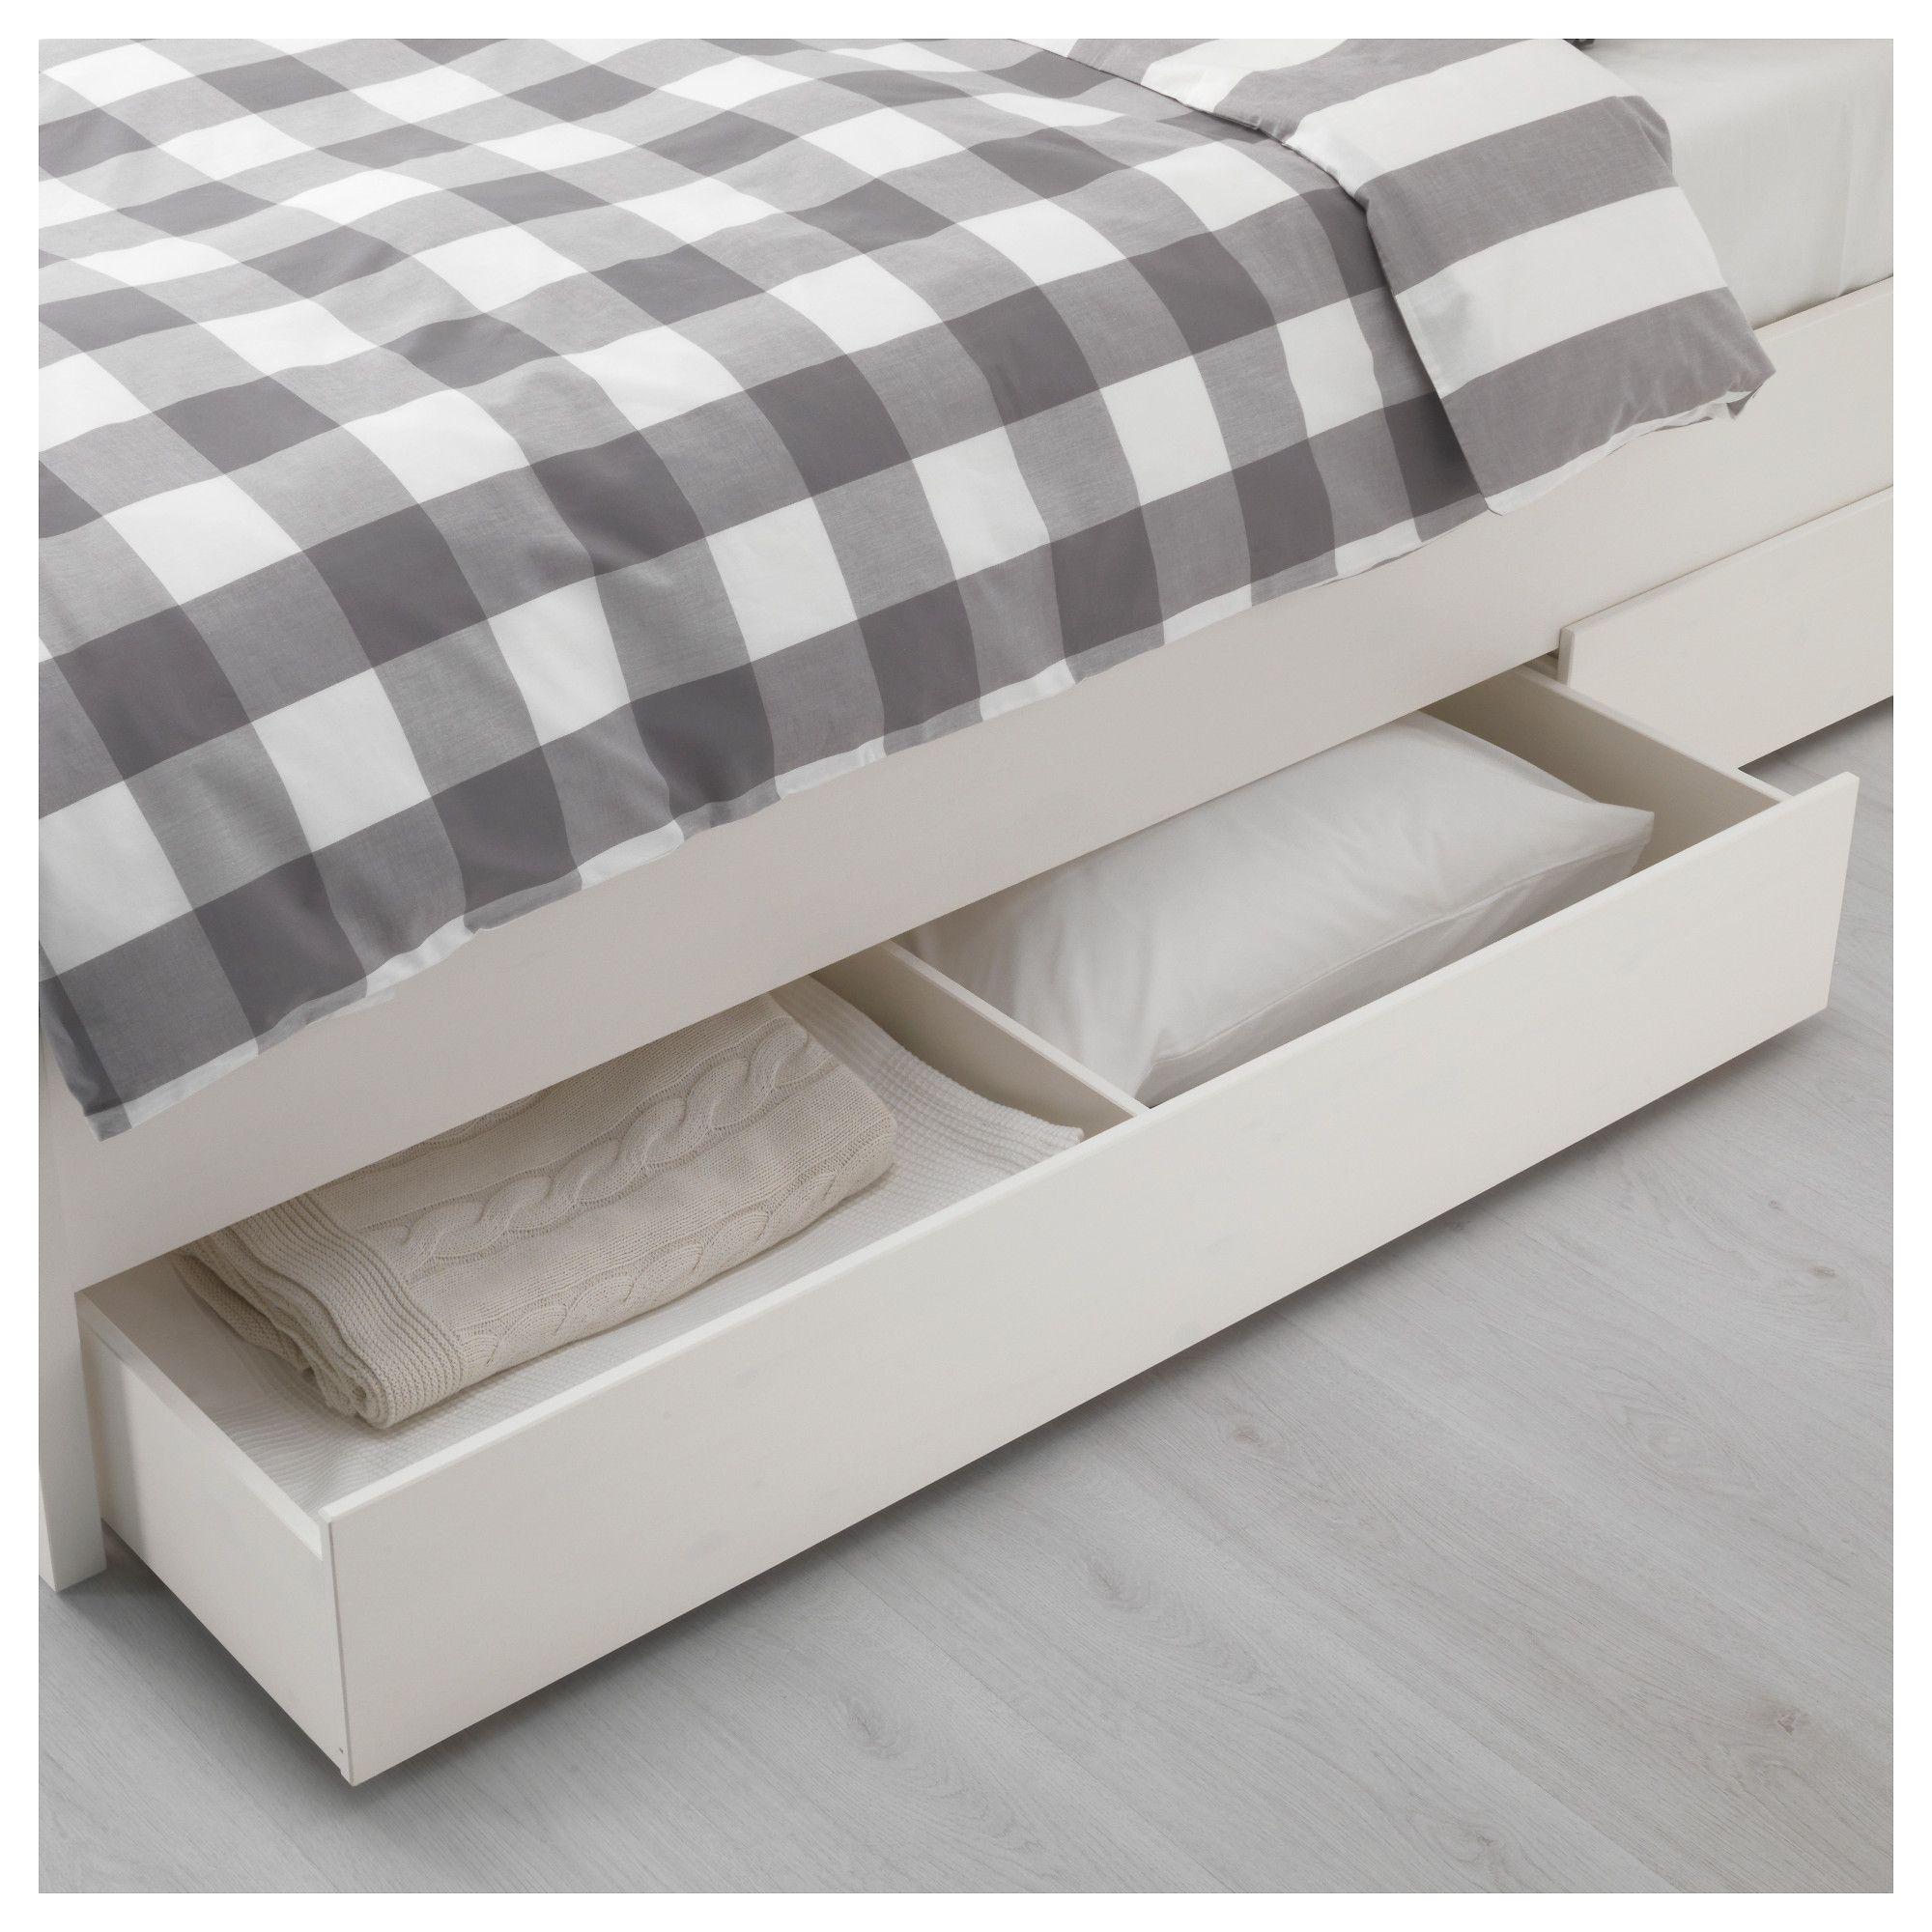 Ikea Hemnes Bed Frame With 4 Storage Boxes White Stain Espevar